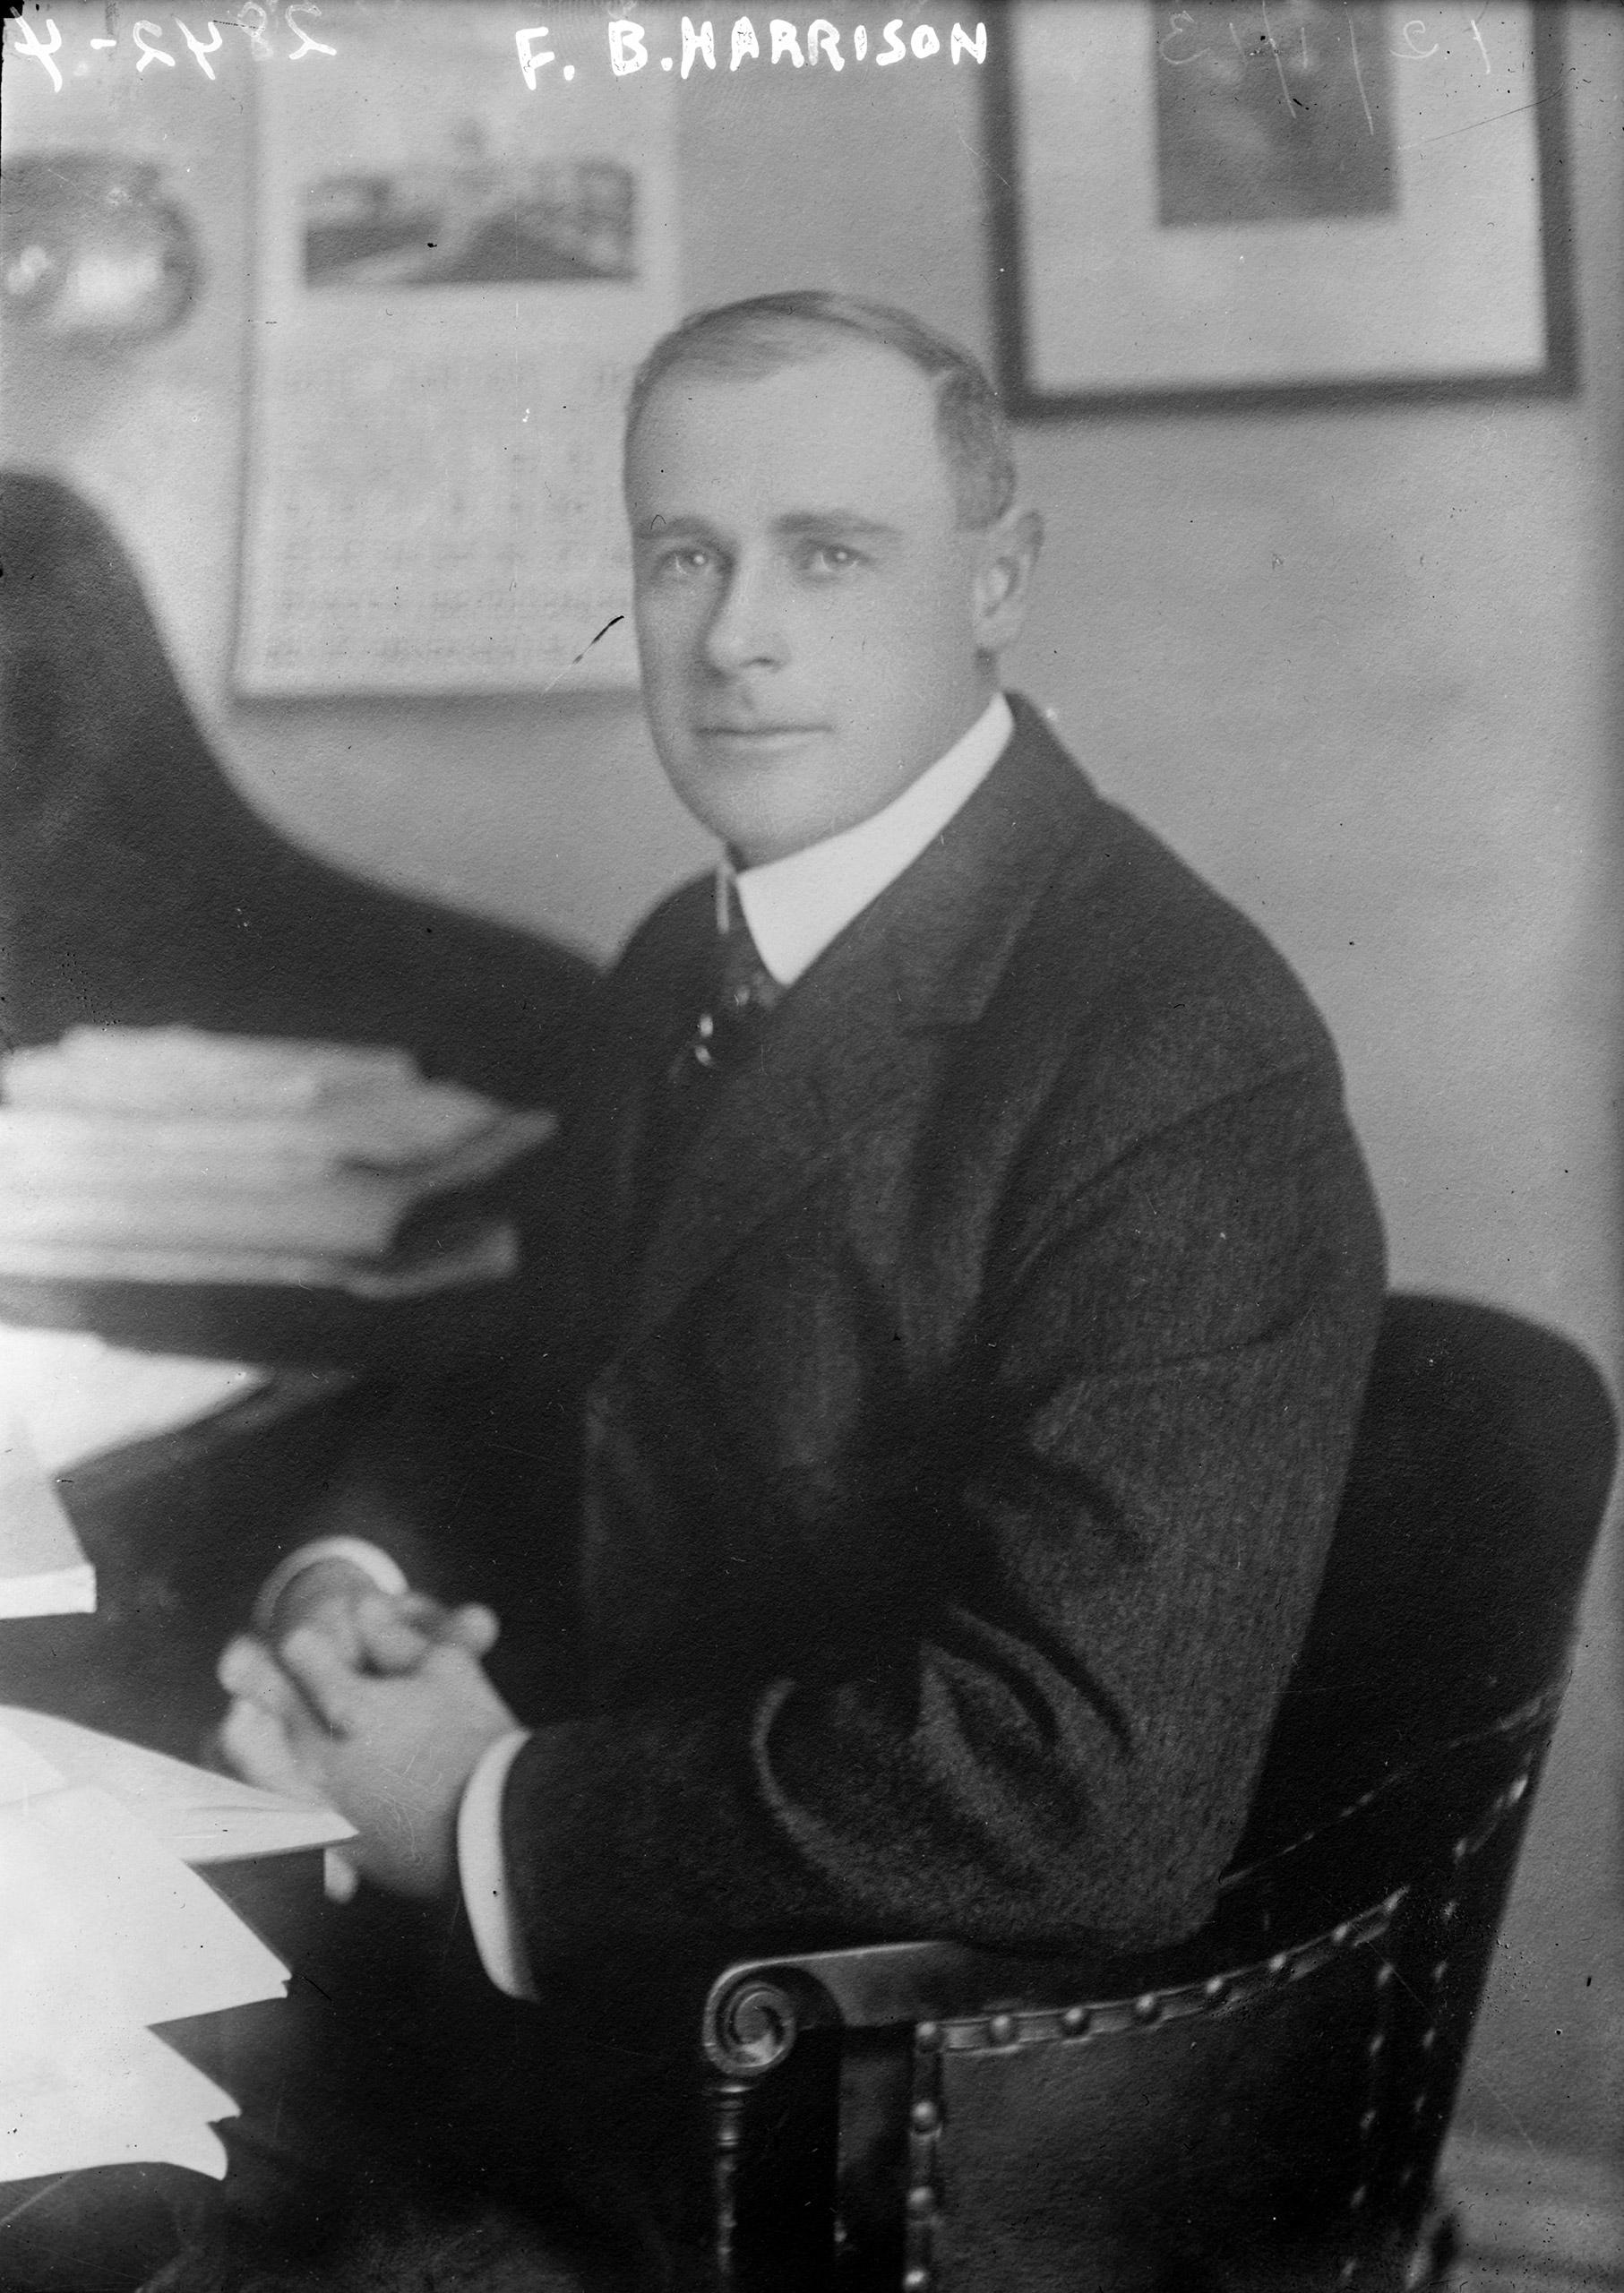 Portrait of Francis Burton Harrison, 1913.